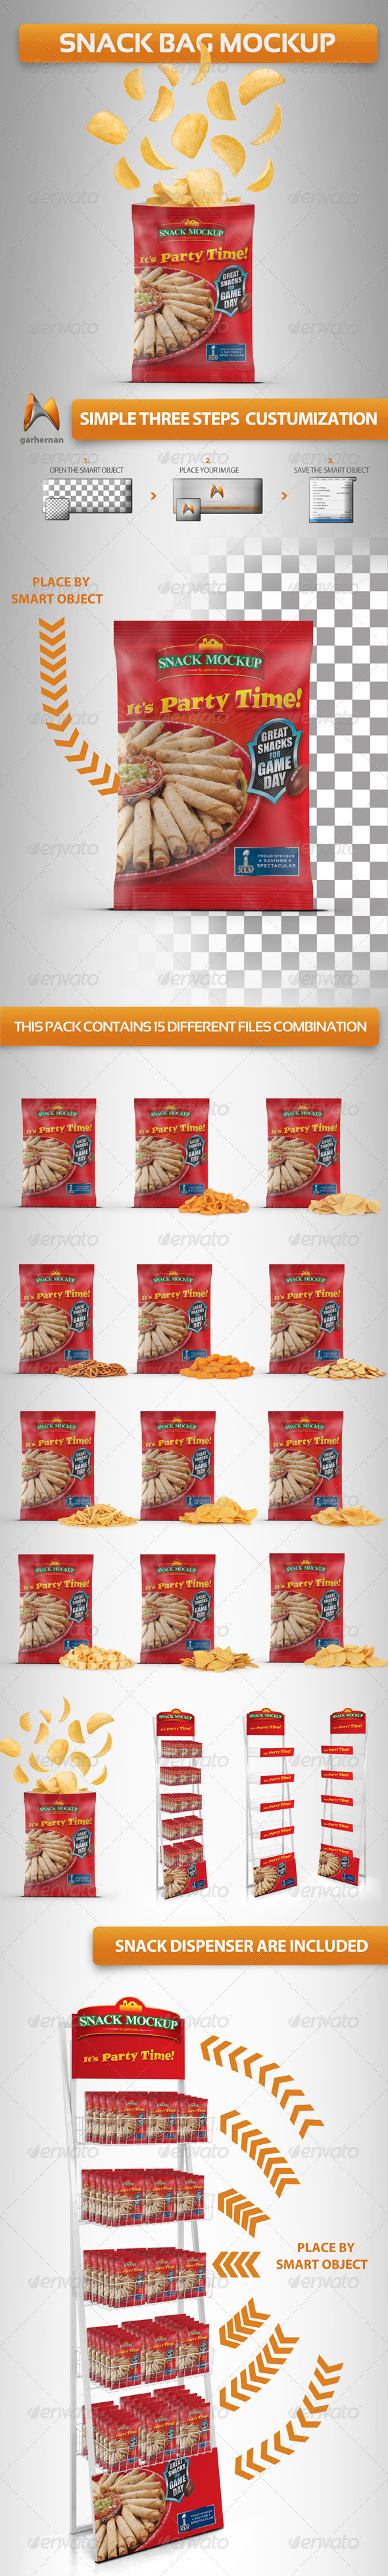 Snack Bag Mockup - Food and Drink Packaging